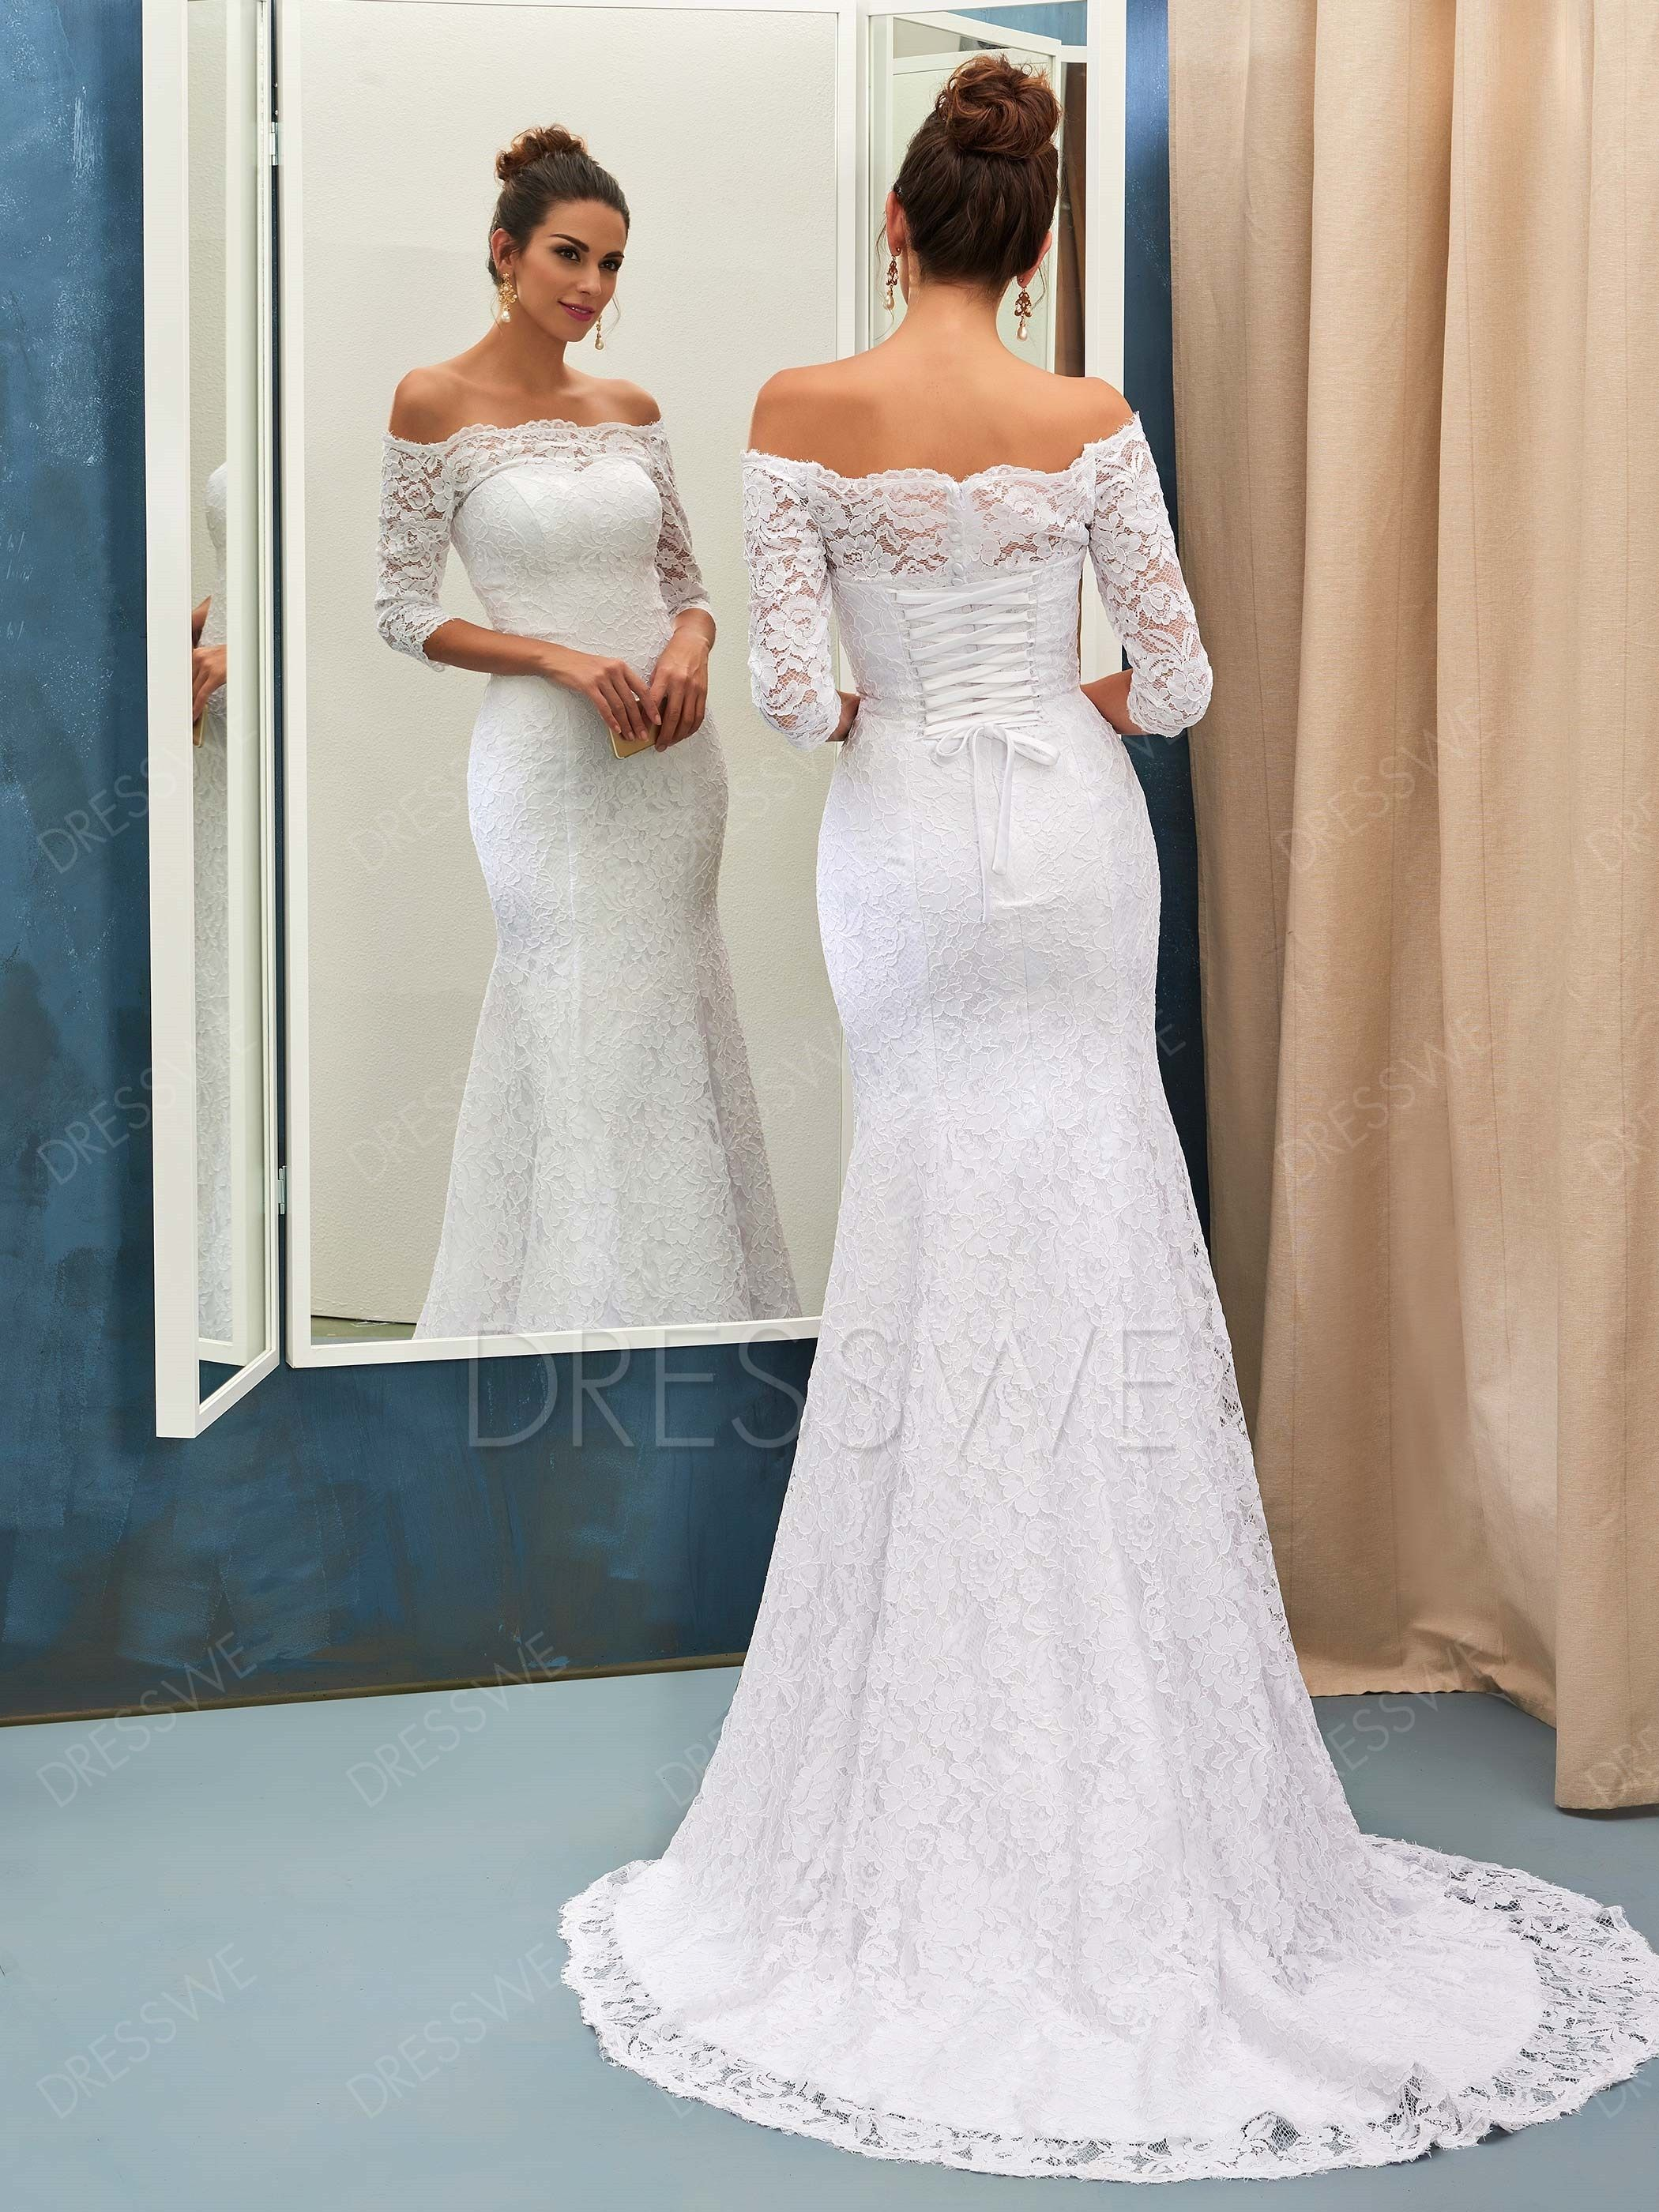 4bb74e102 Buy Stunning Off-The-Shoulder 3/4-Length Sleeves Mermaid Wedding Dress  Online, Dresswe.Com offer high quality fashion,Price: USD$181.16